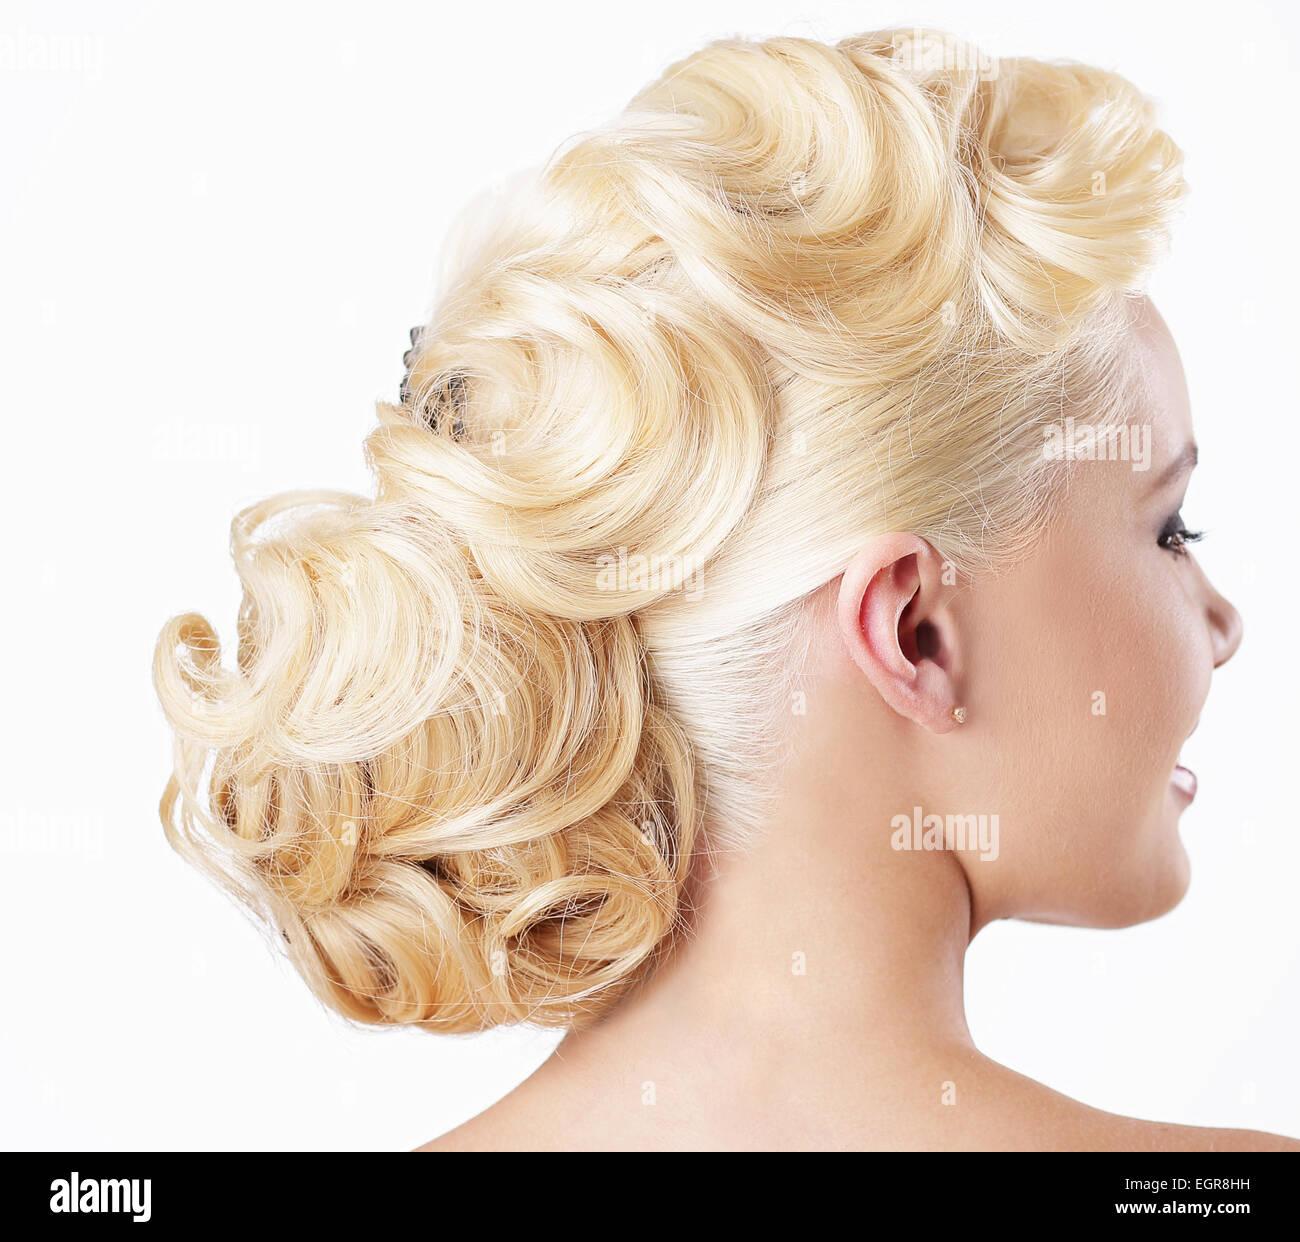 La elegancia. Vista trasera de la rubia con peinado festivo Imagen De Stock